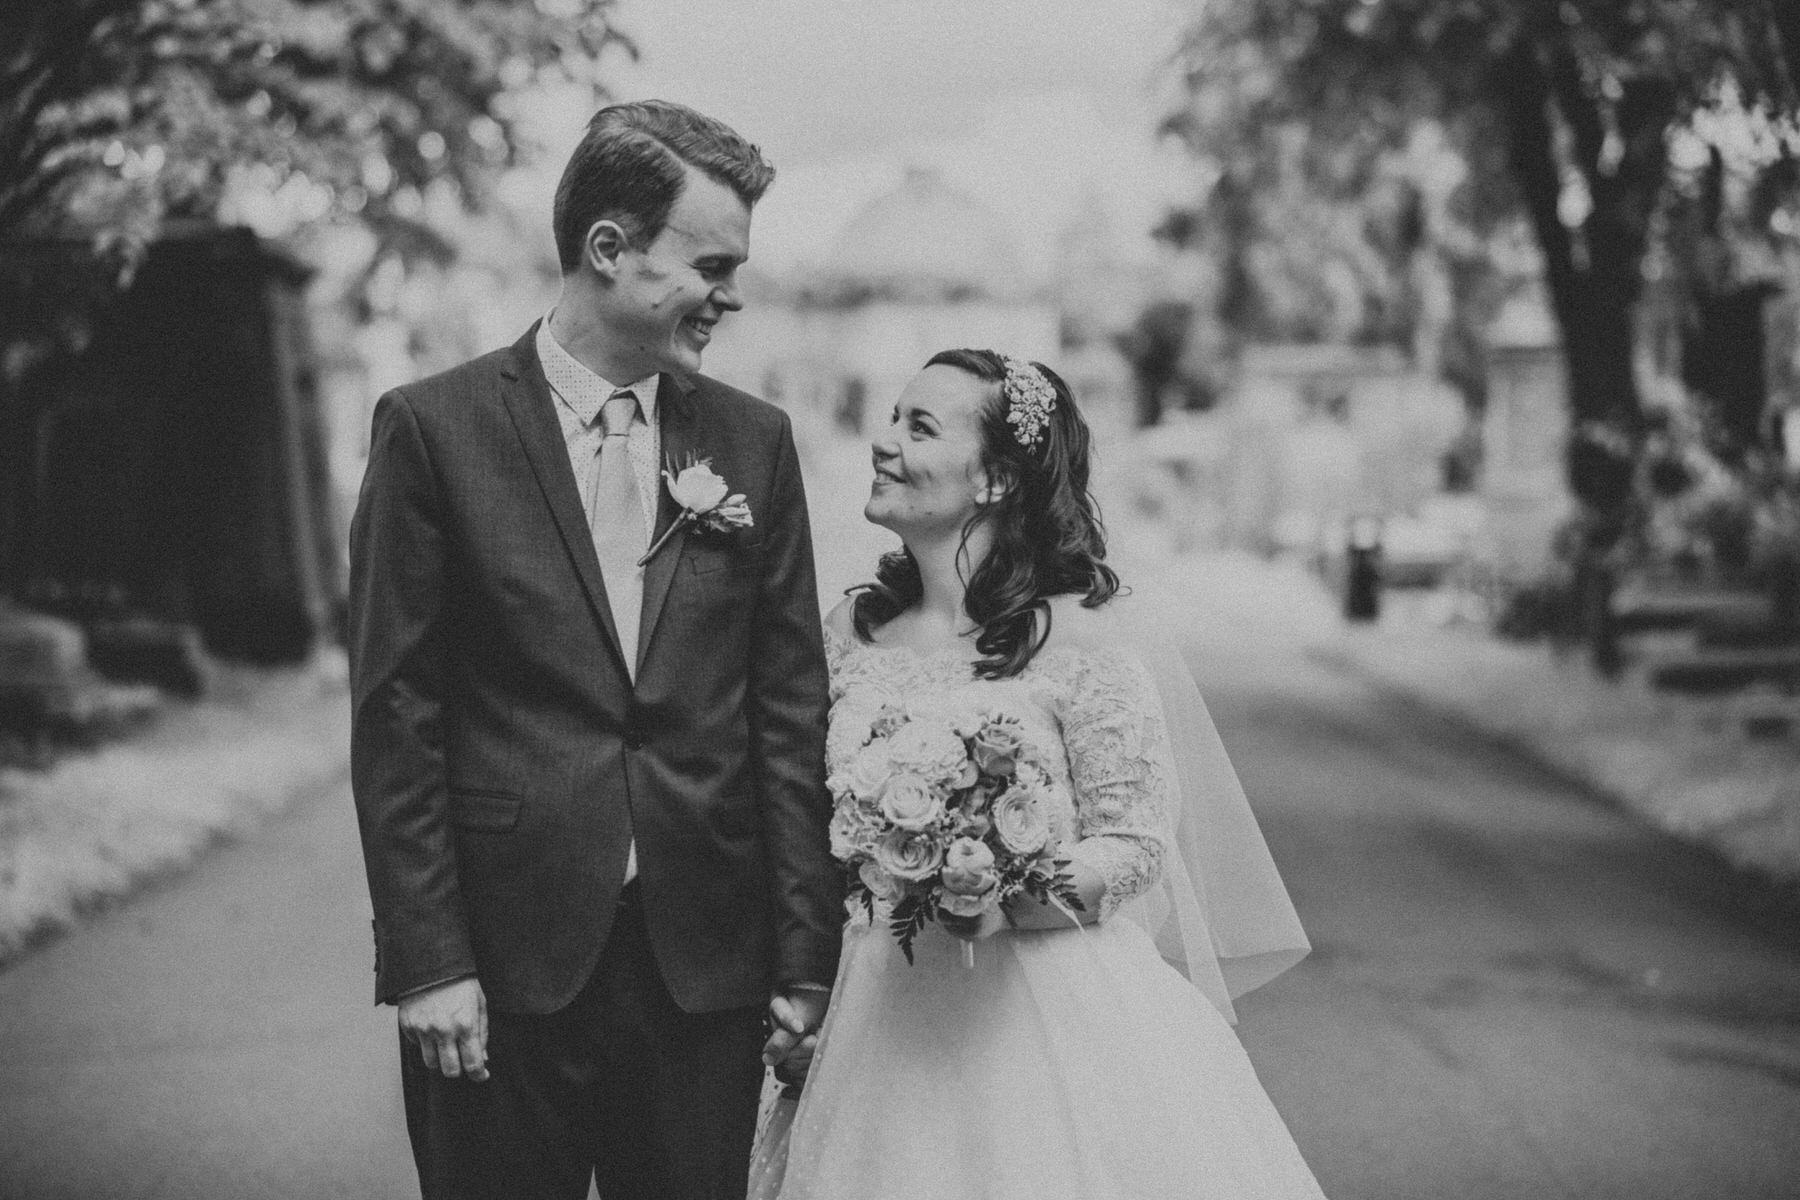 BW groom bride wedding portraits Brompton Cemetery.jpg